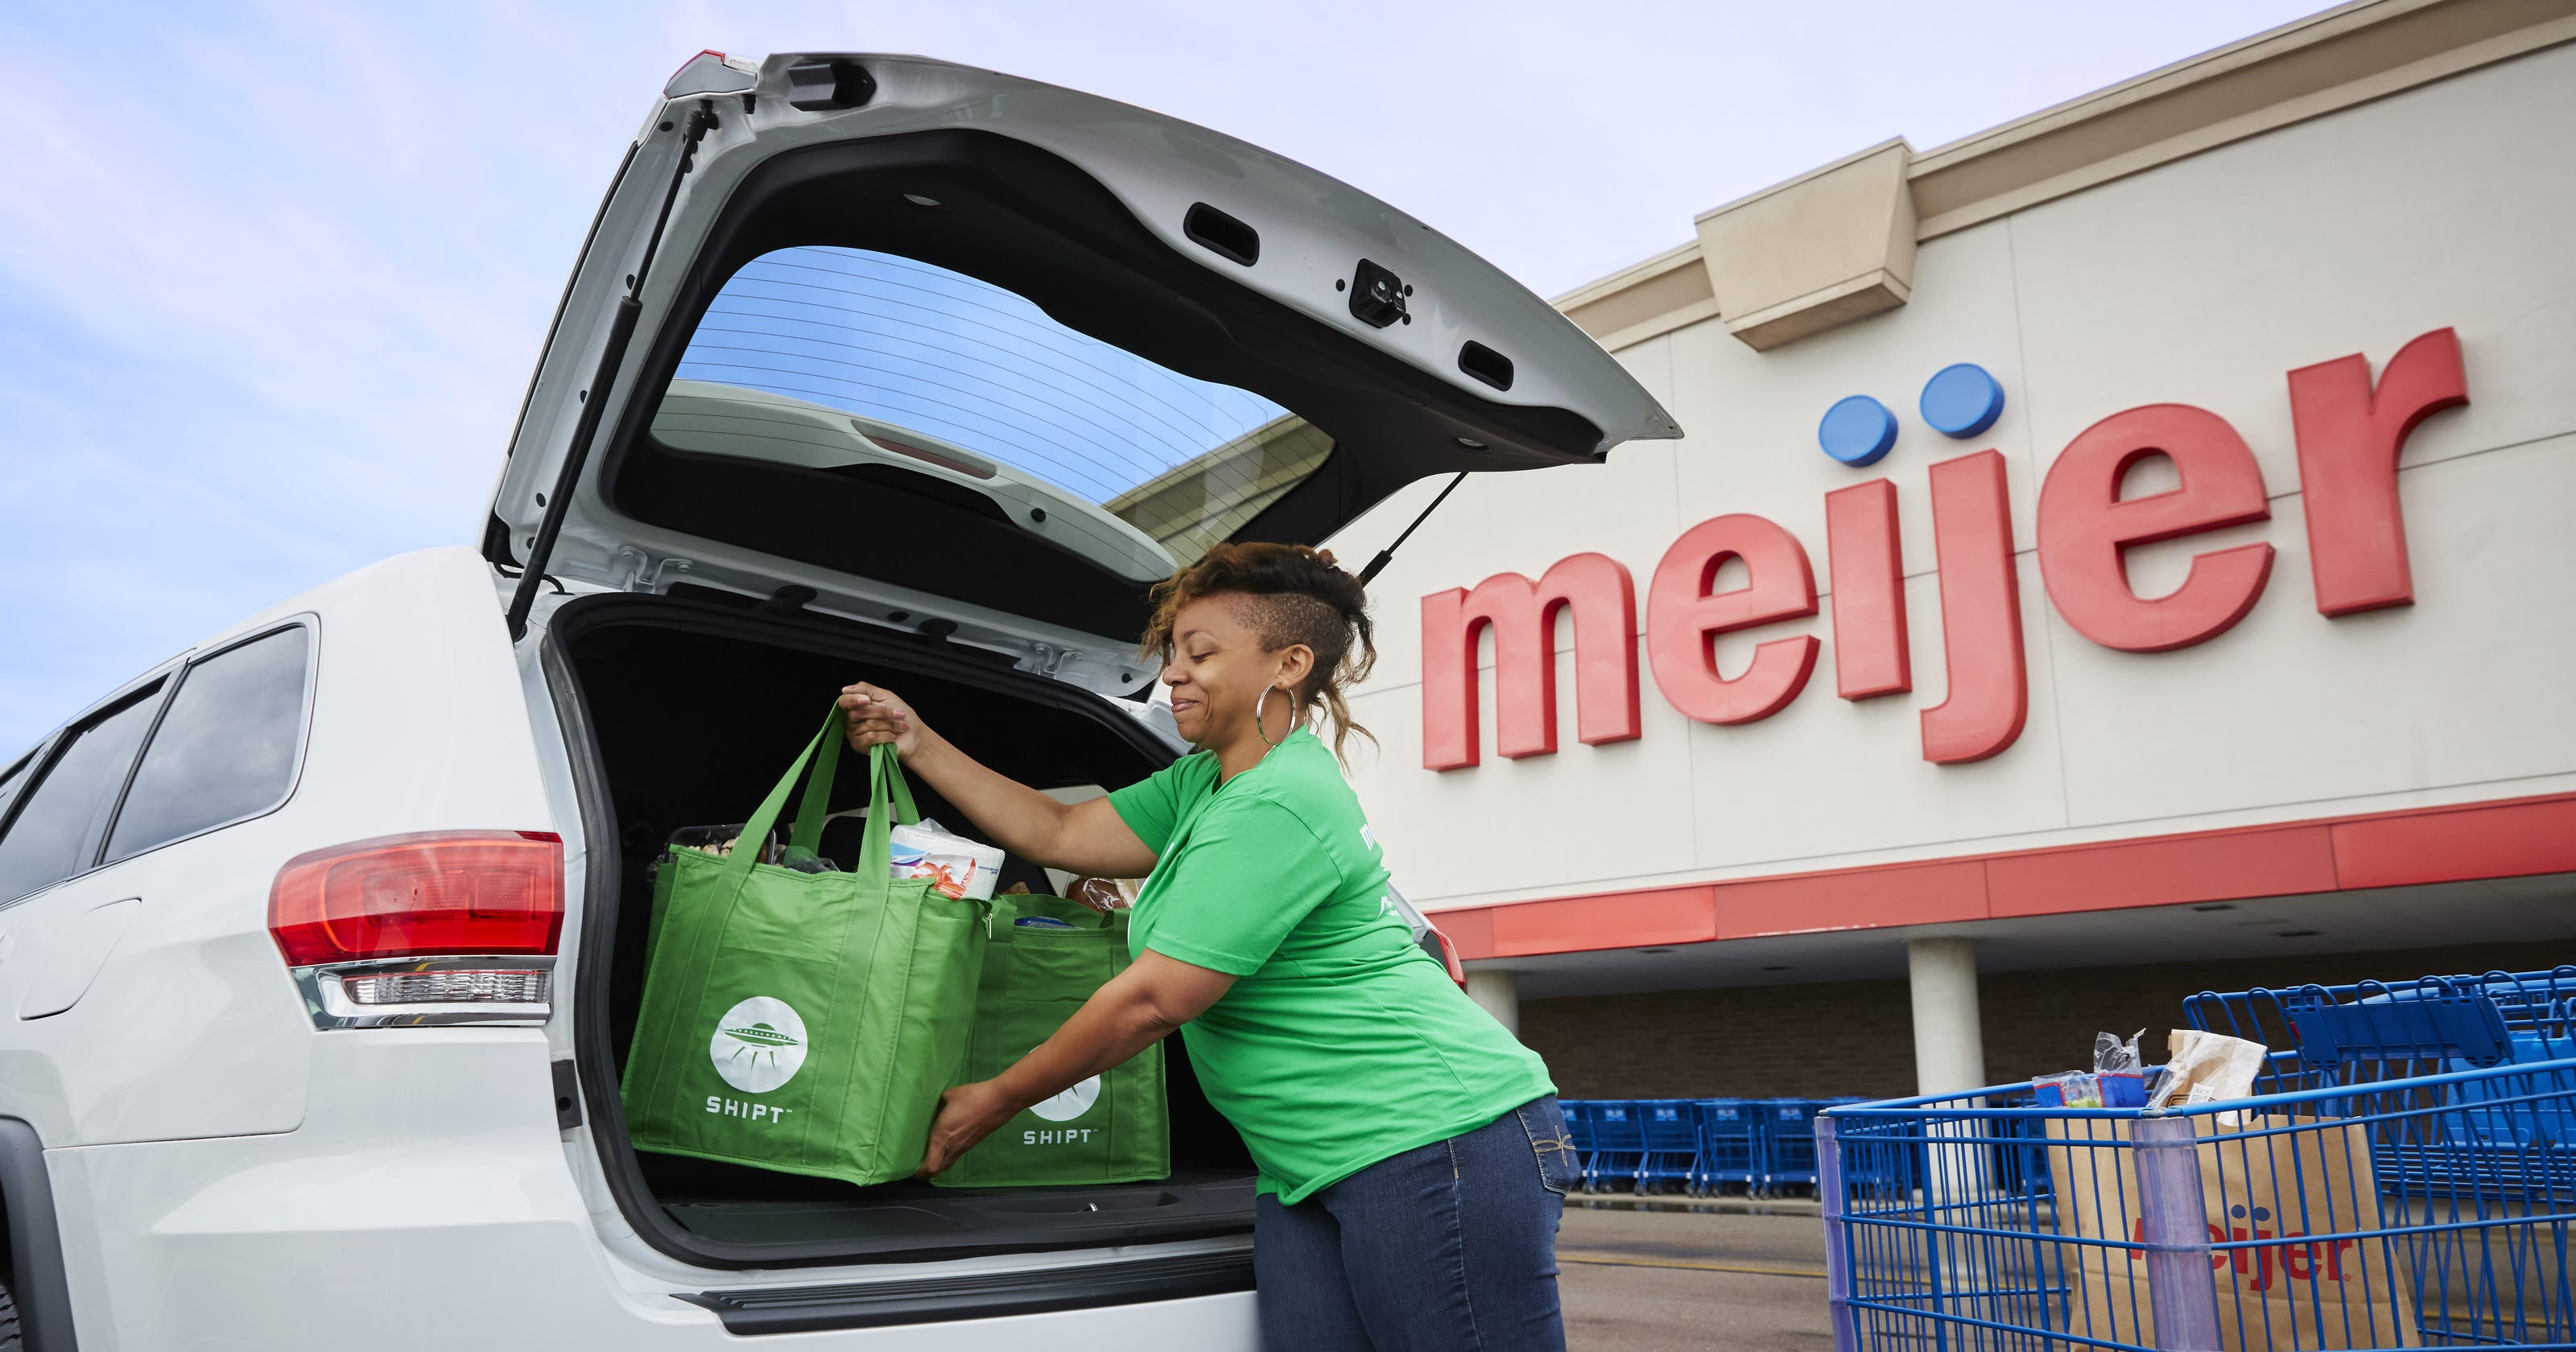 Comparison: Grocery delivery services in Cincinnati